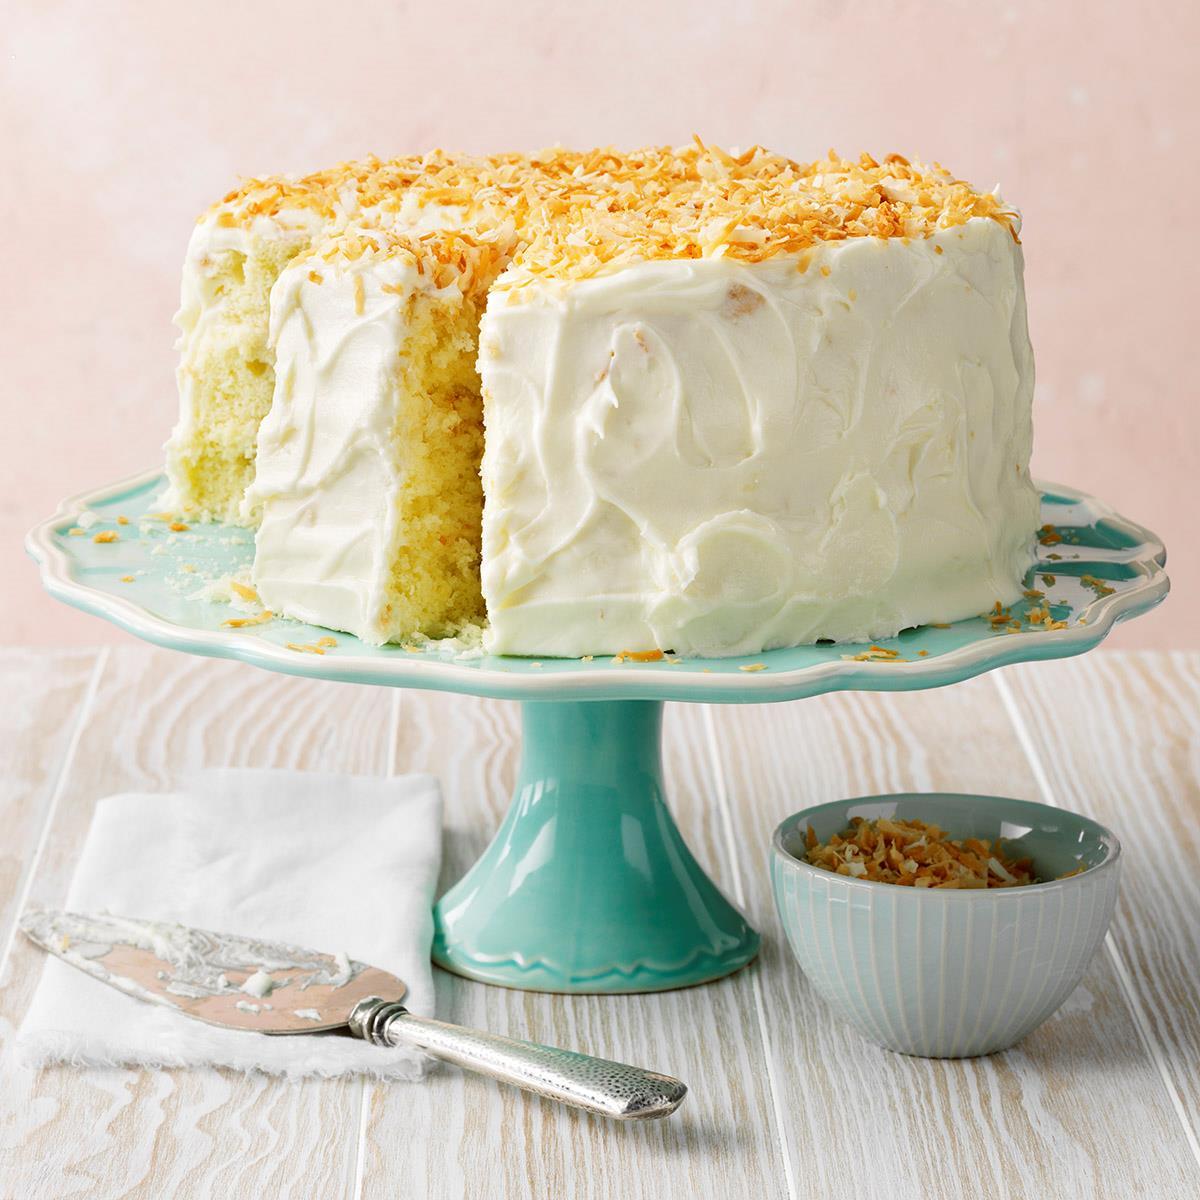 Incredible Coconut Cake image